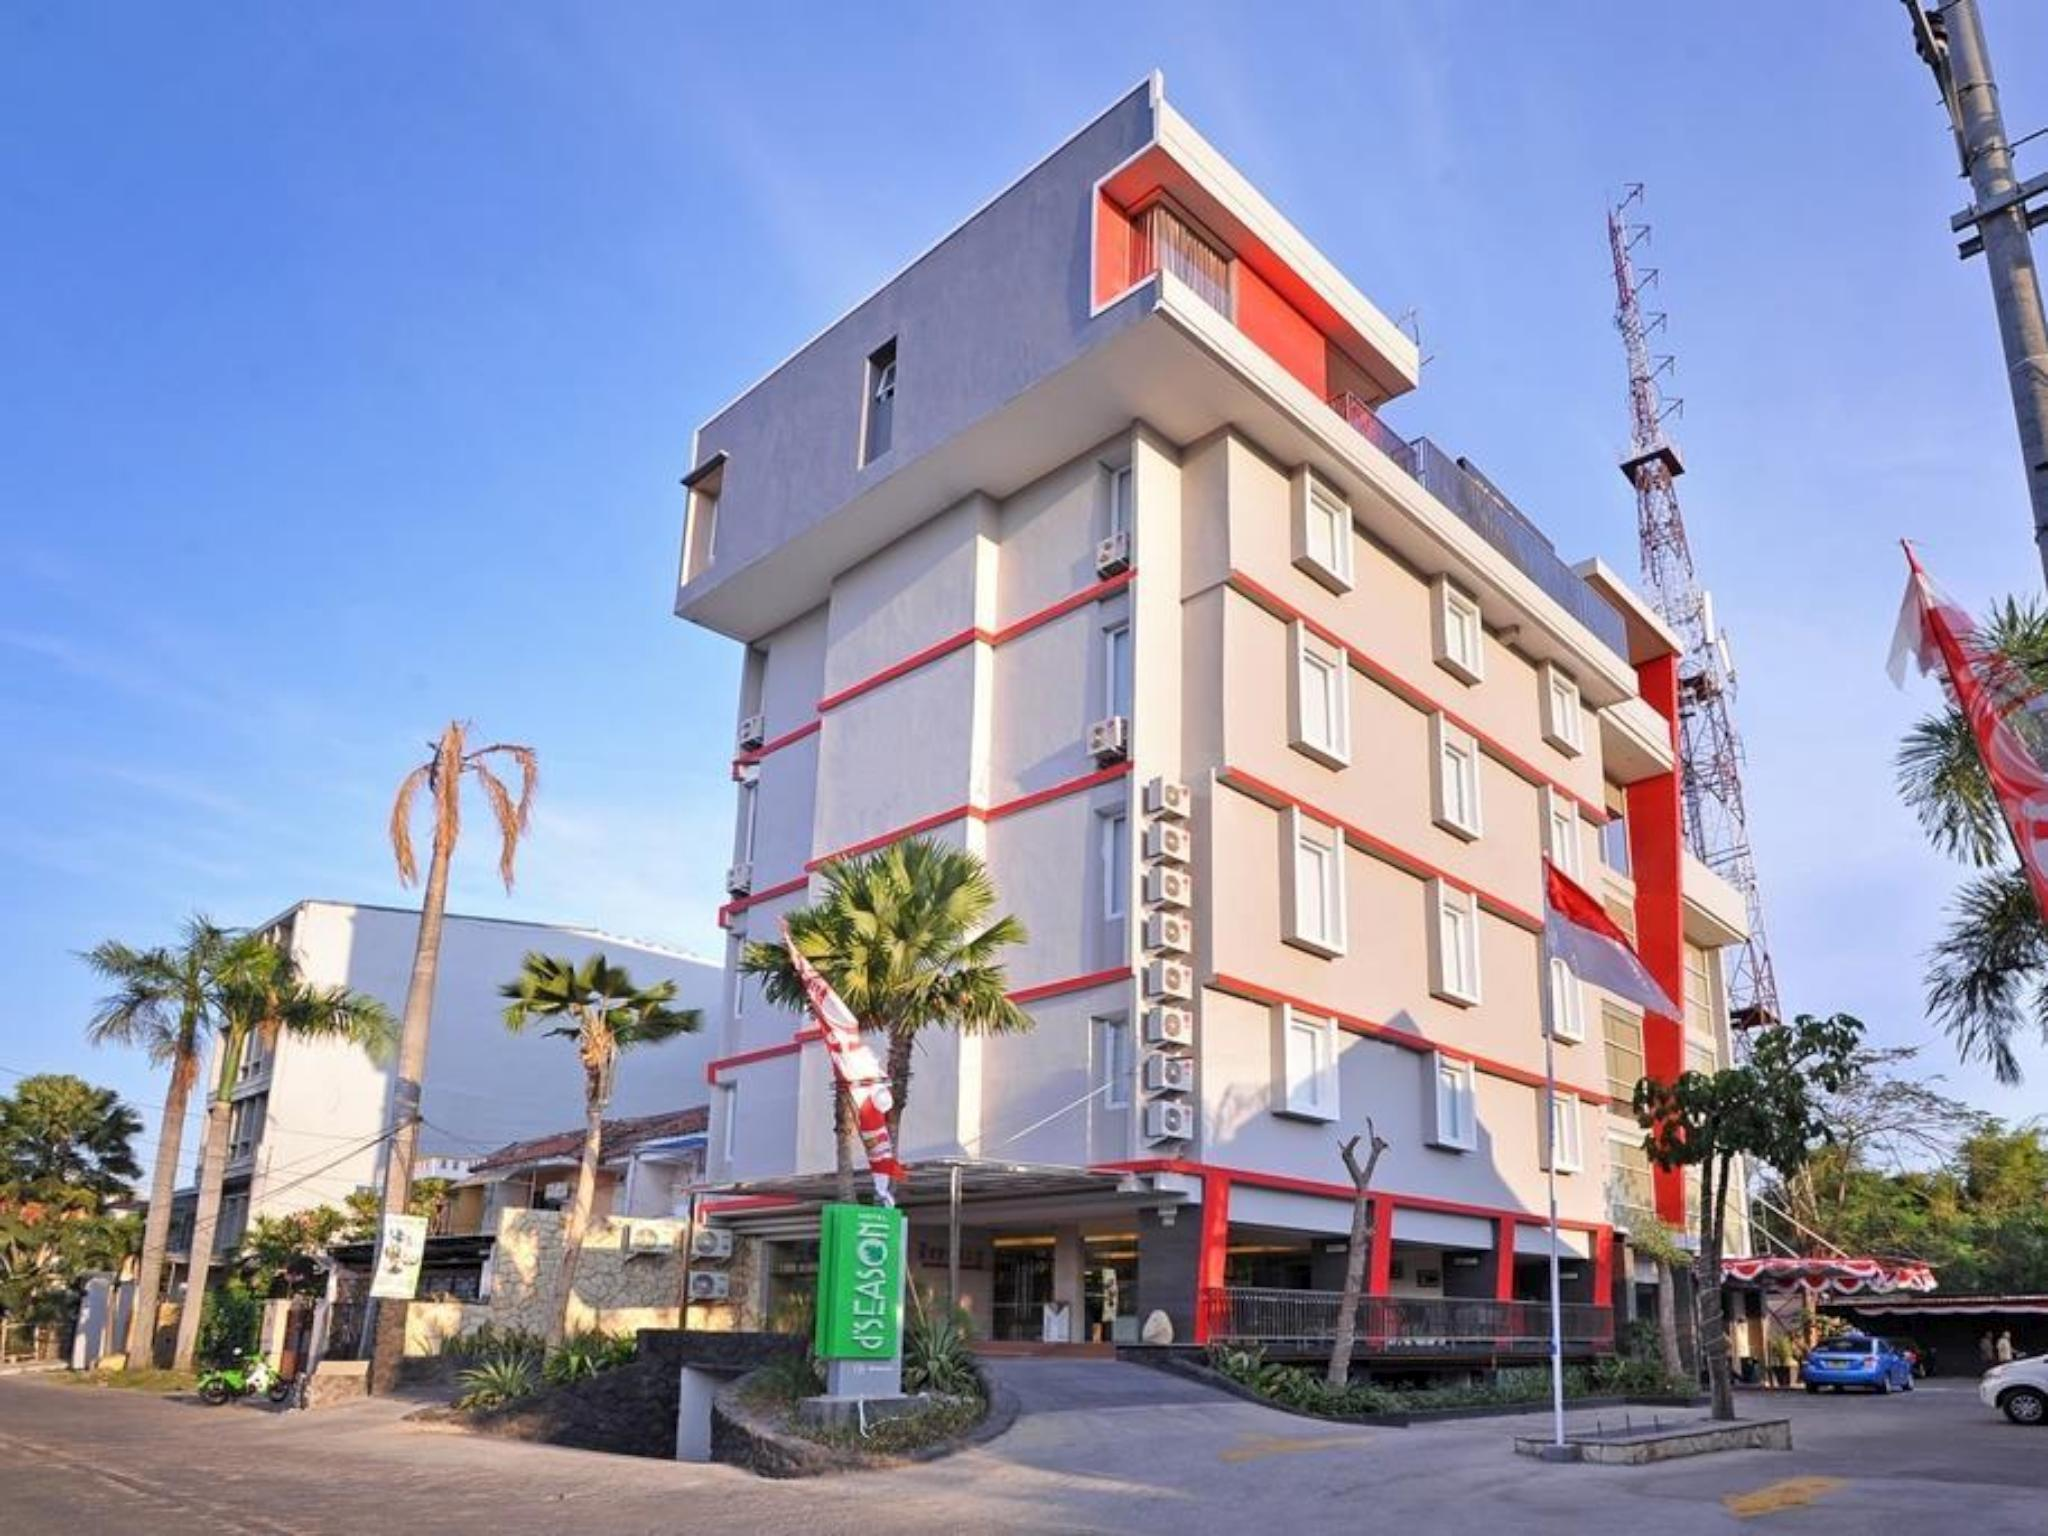 RedDoorz Premium @ D'Season Hotel Jemursari